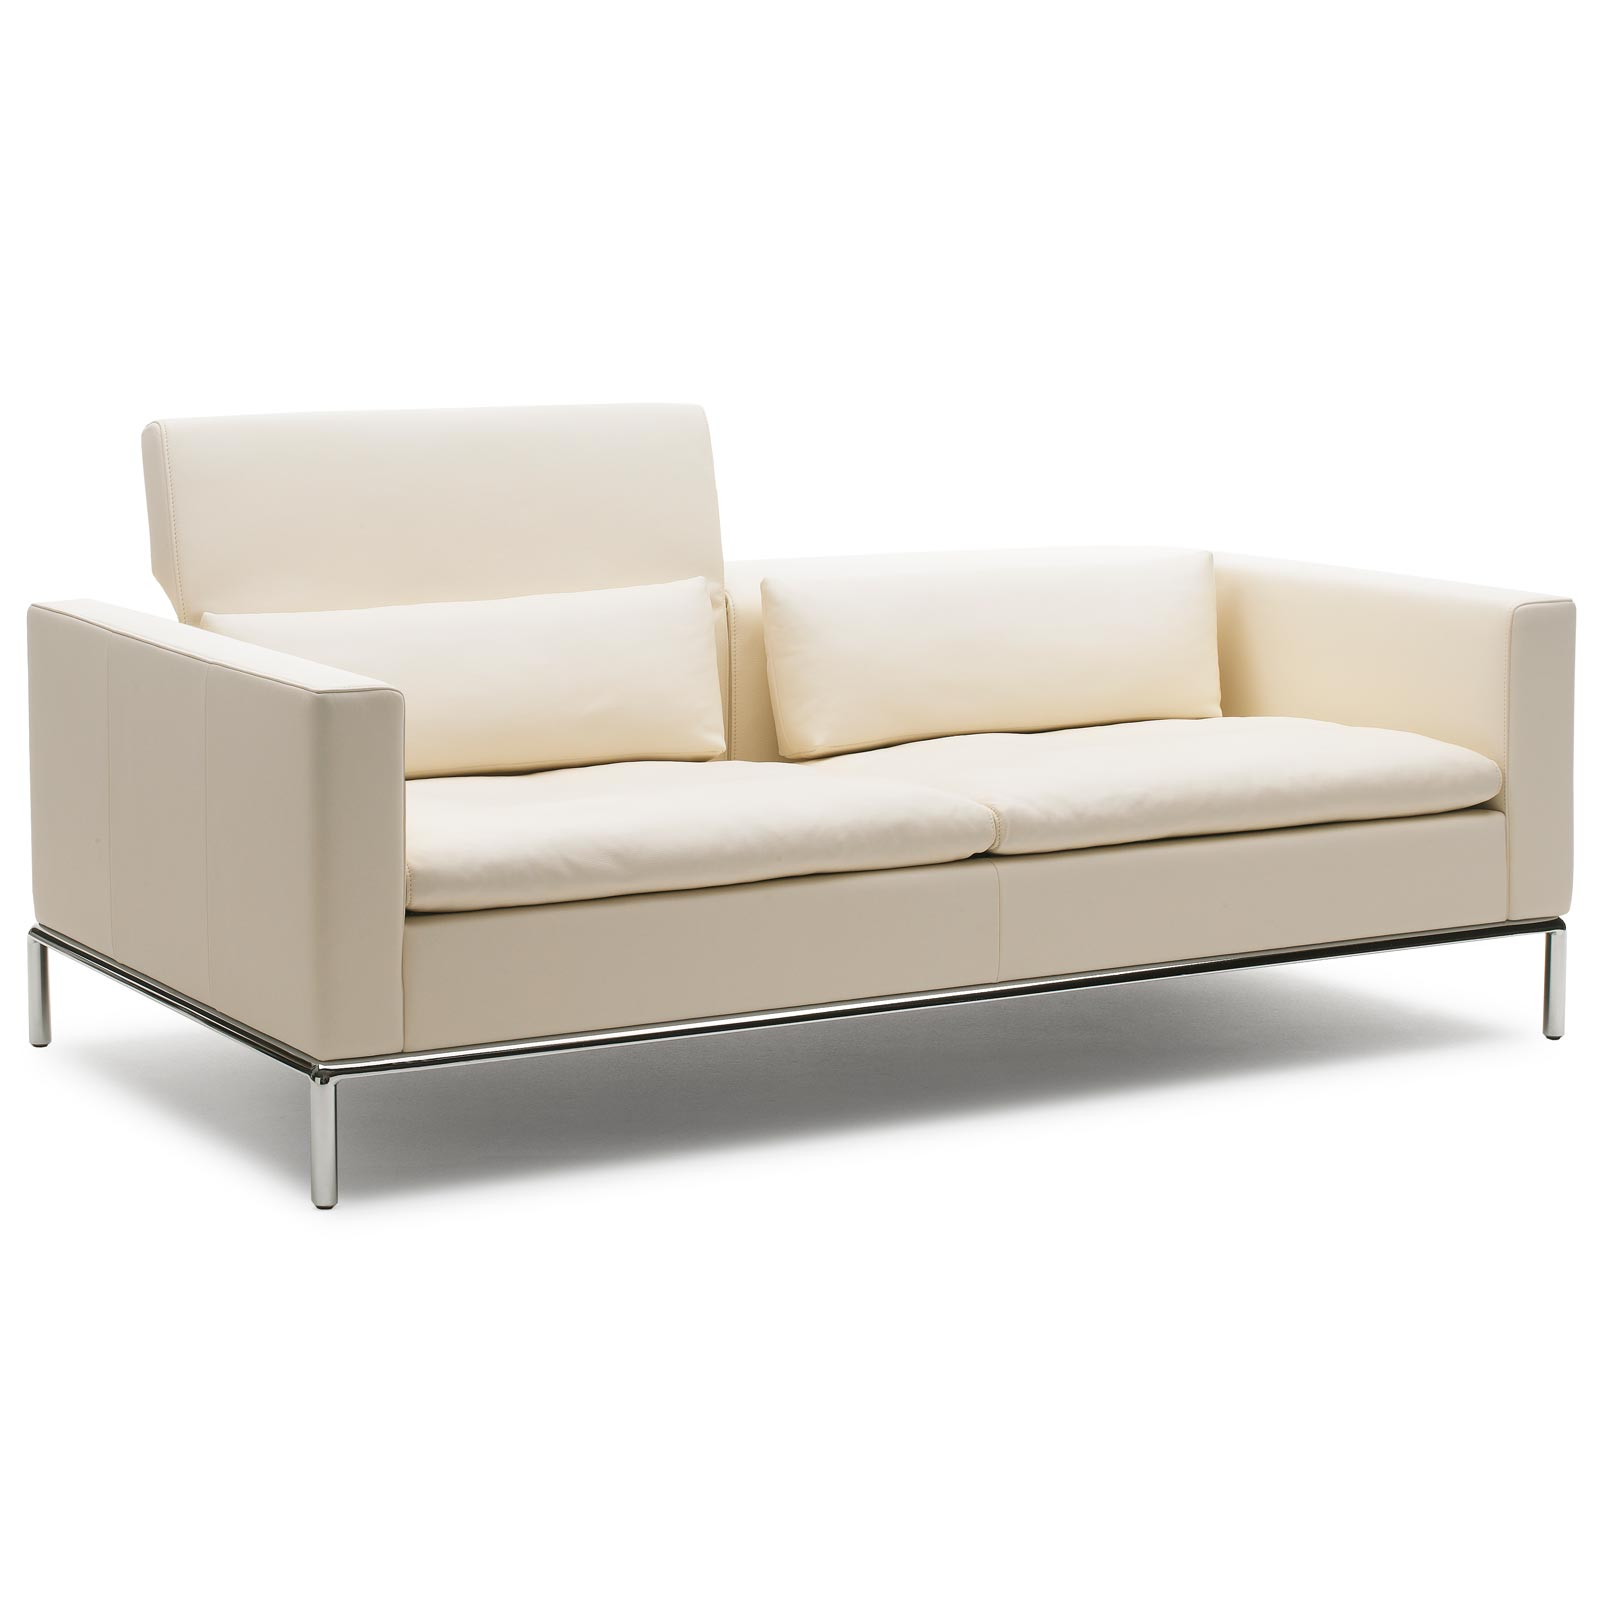 Full Size of De Sede Sofa Gebraucht Kaufen Couch Preis Outlet Endless Ds 600 Bi Usa Furniture For Sale Uk By Sessel Used Preise Preisliste Series 5 Xora Reinigen Günstig Sofa De Sede Sofa